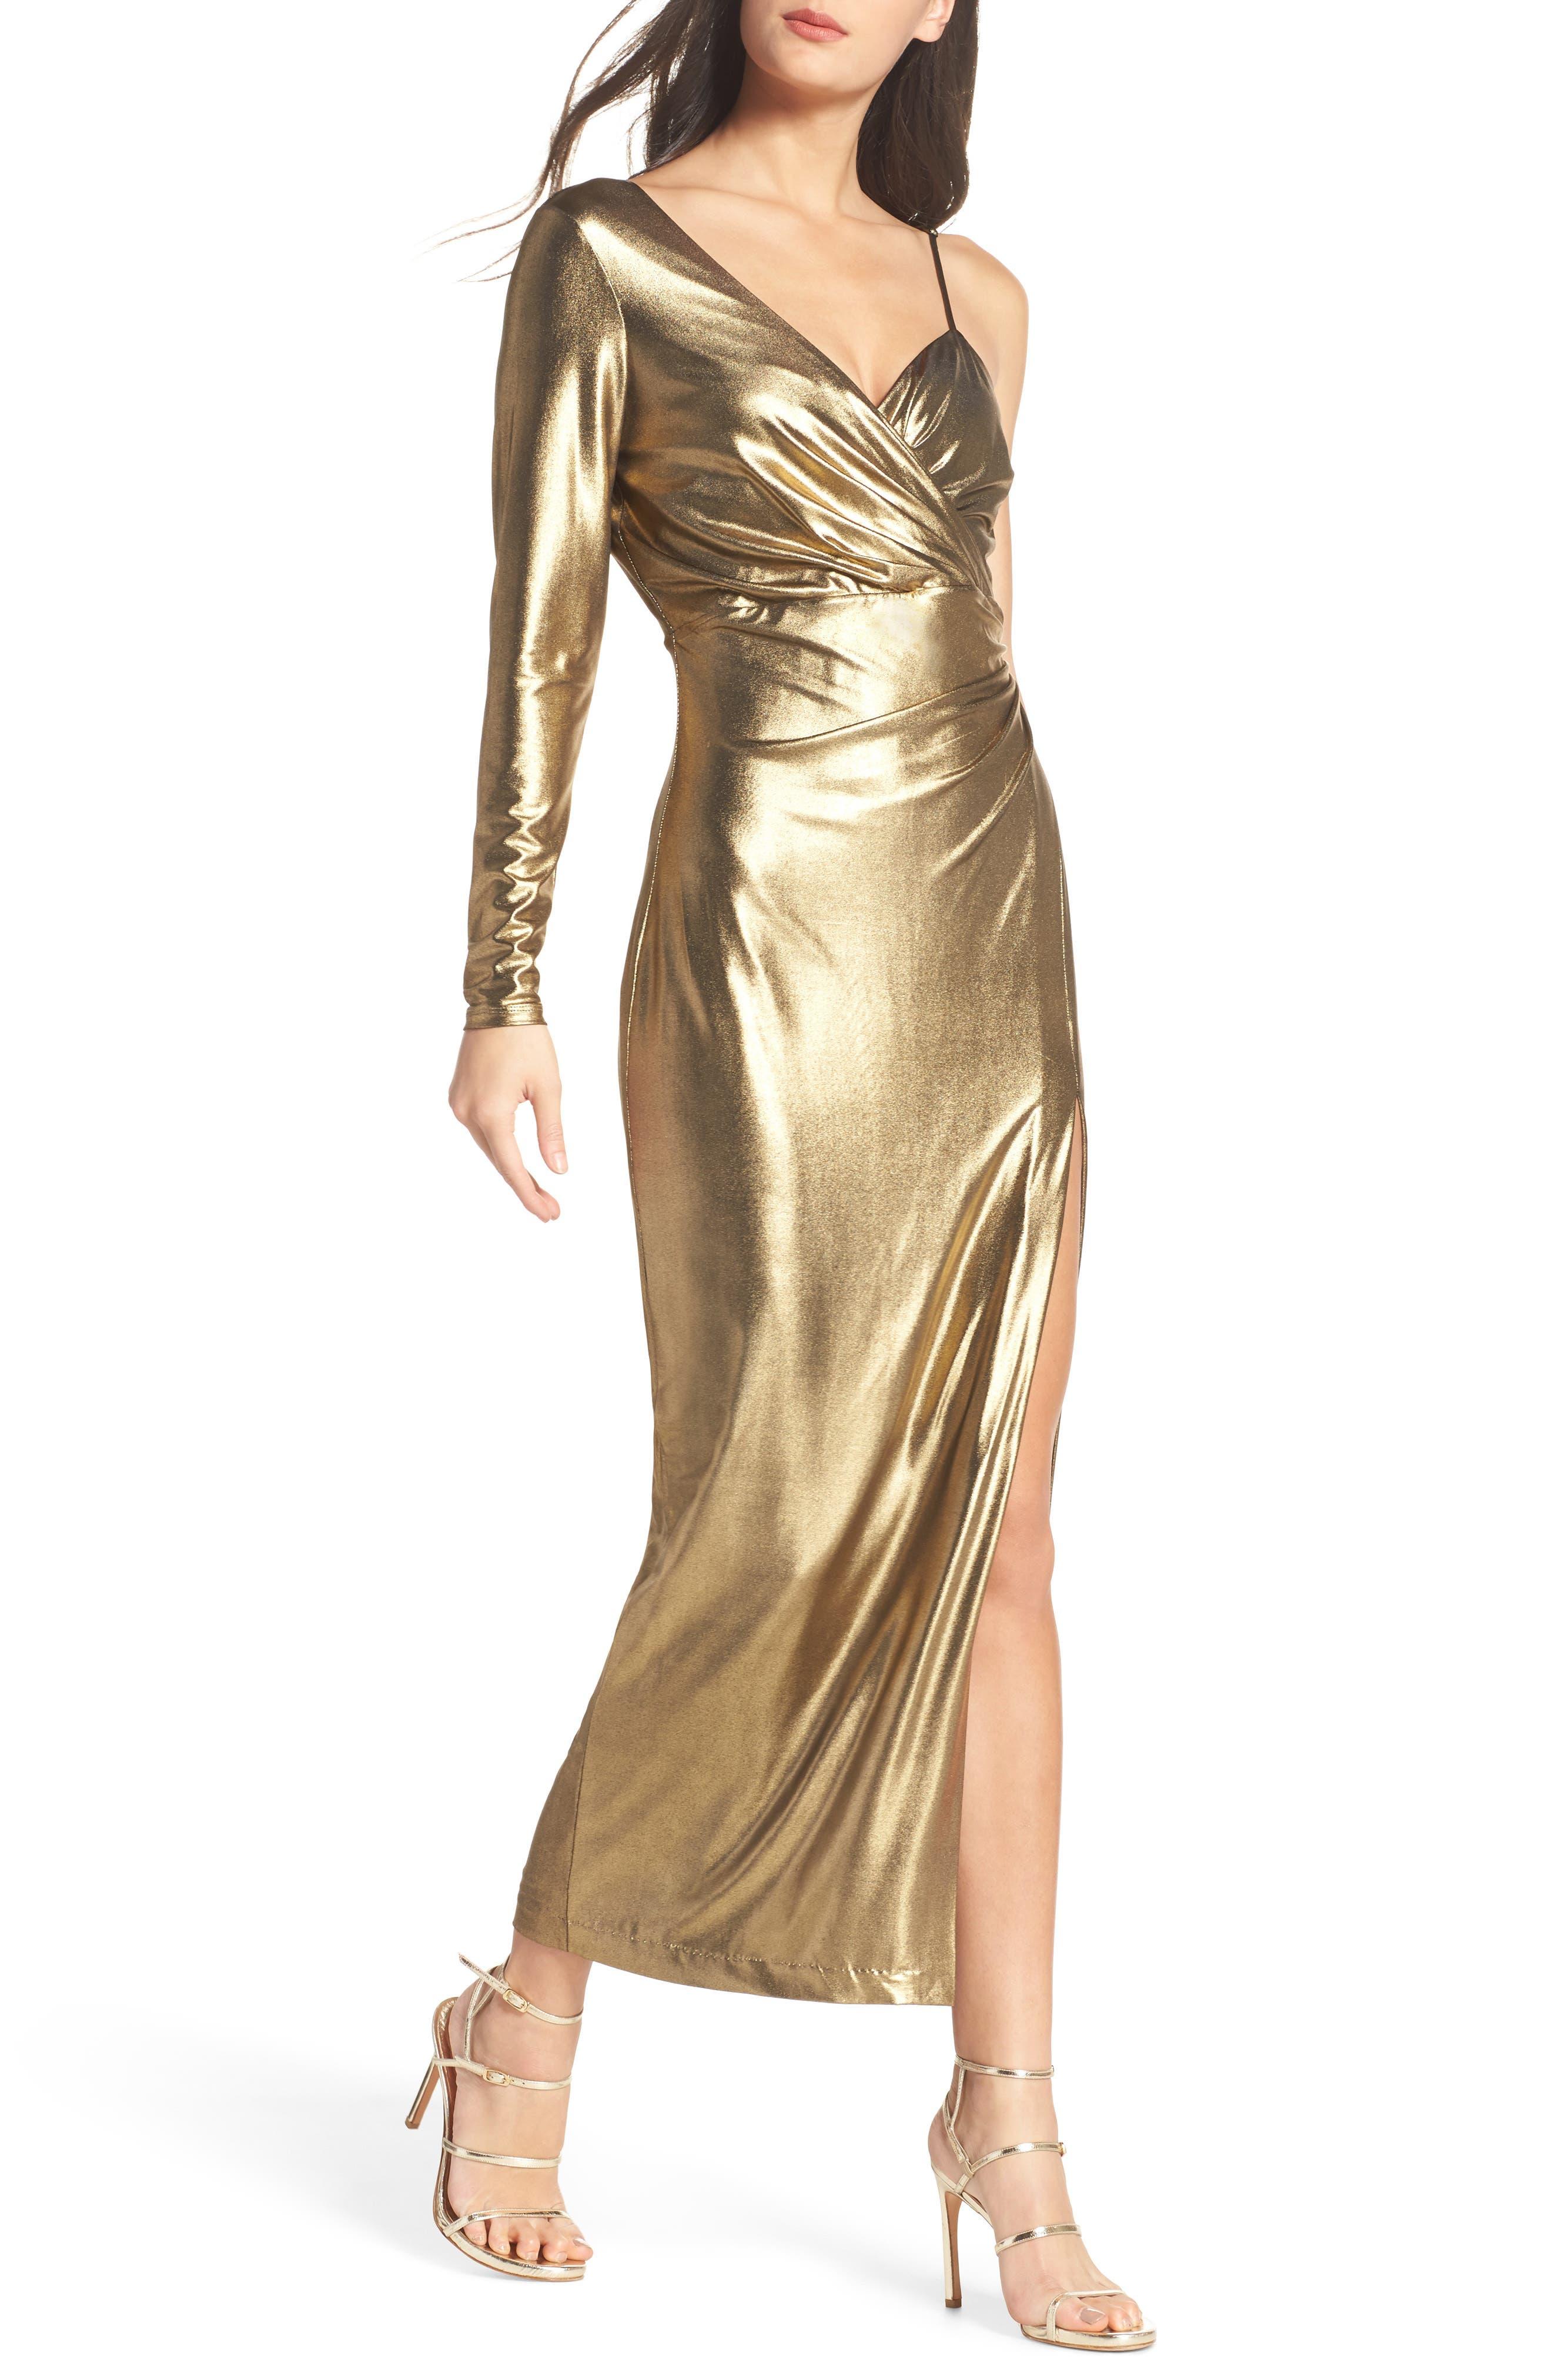 Aurel Metallic Dress,                         Main,                         color, Golden